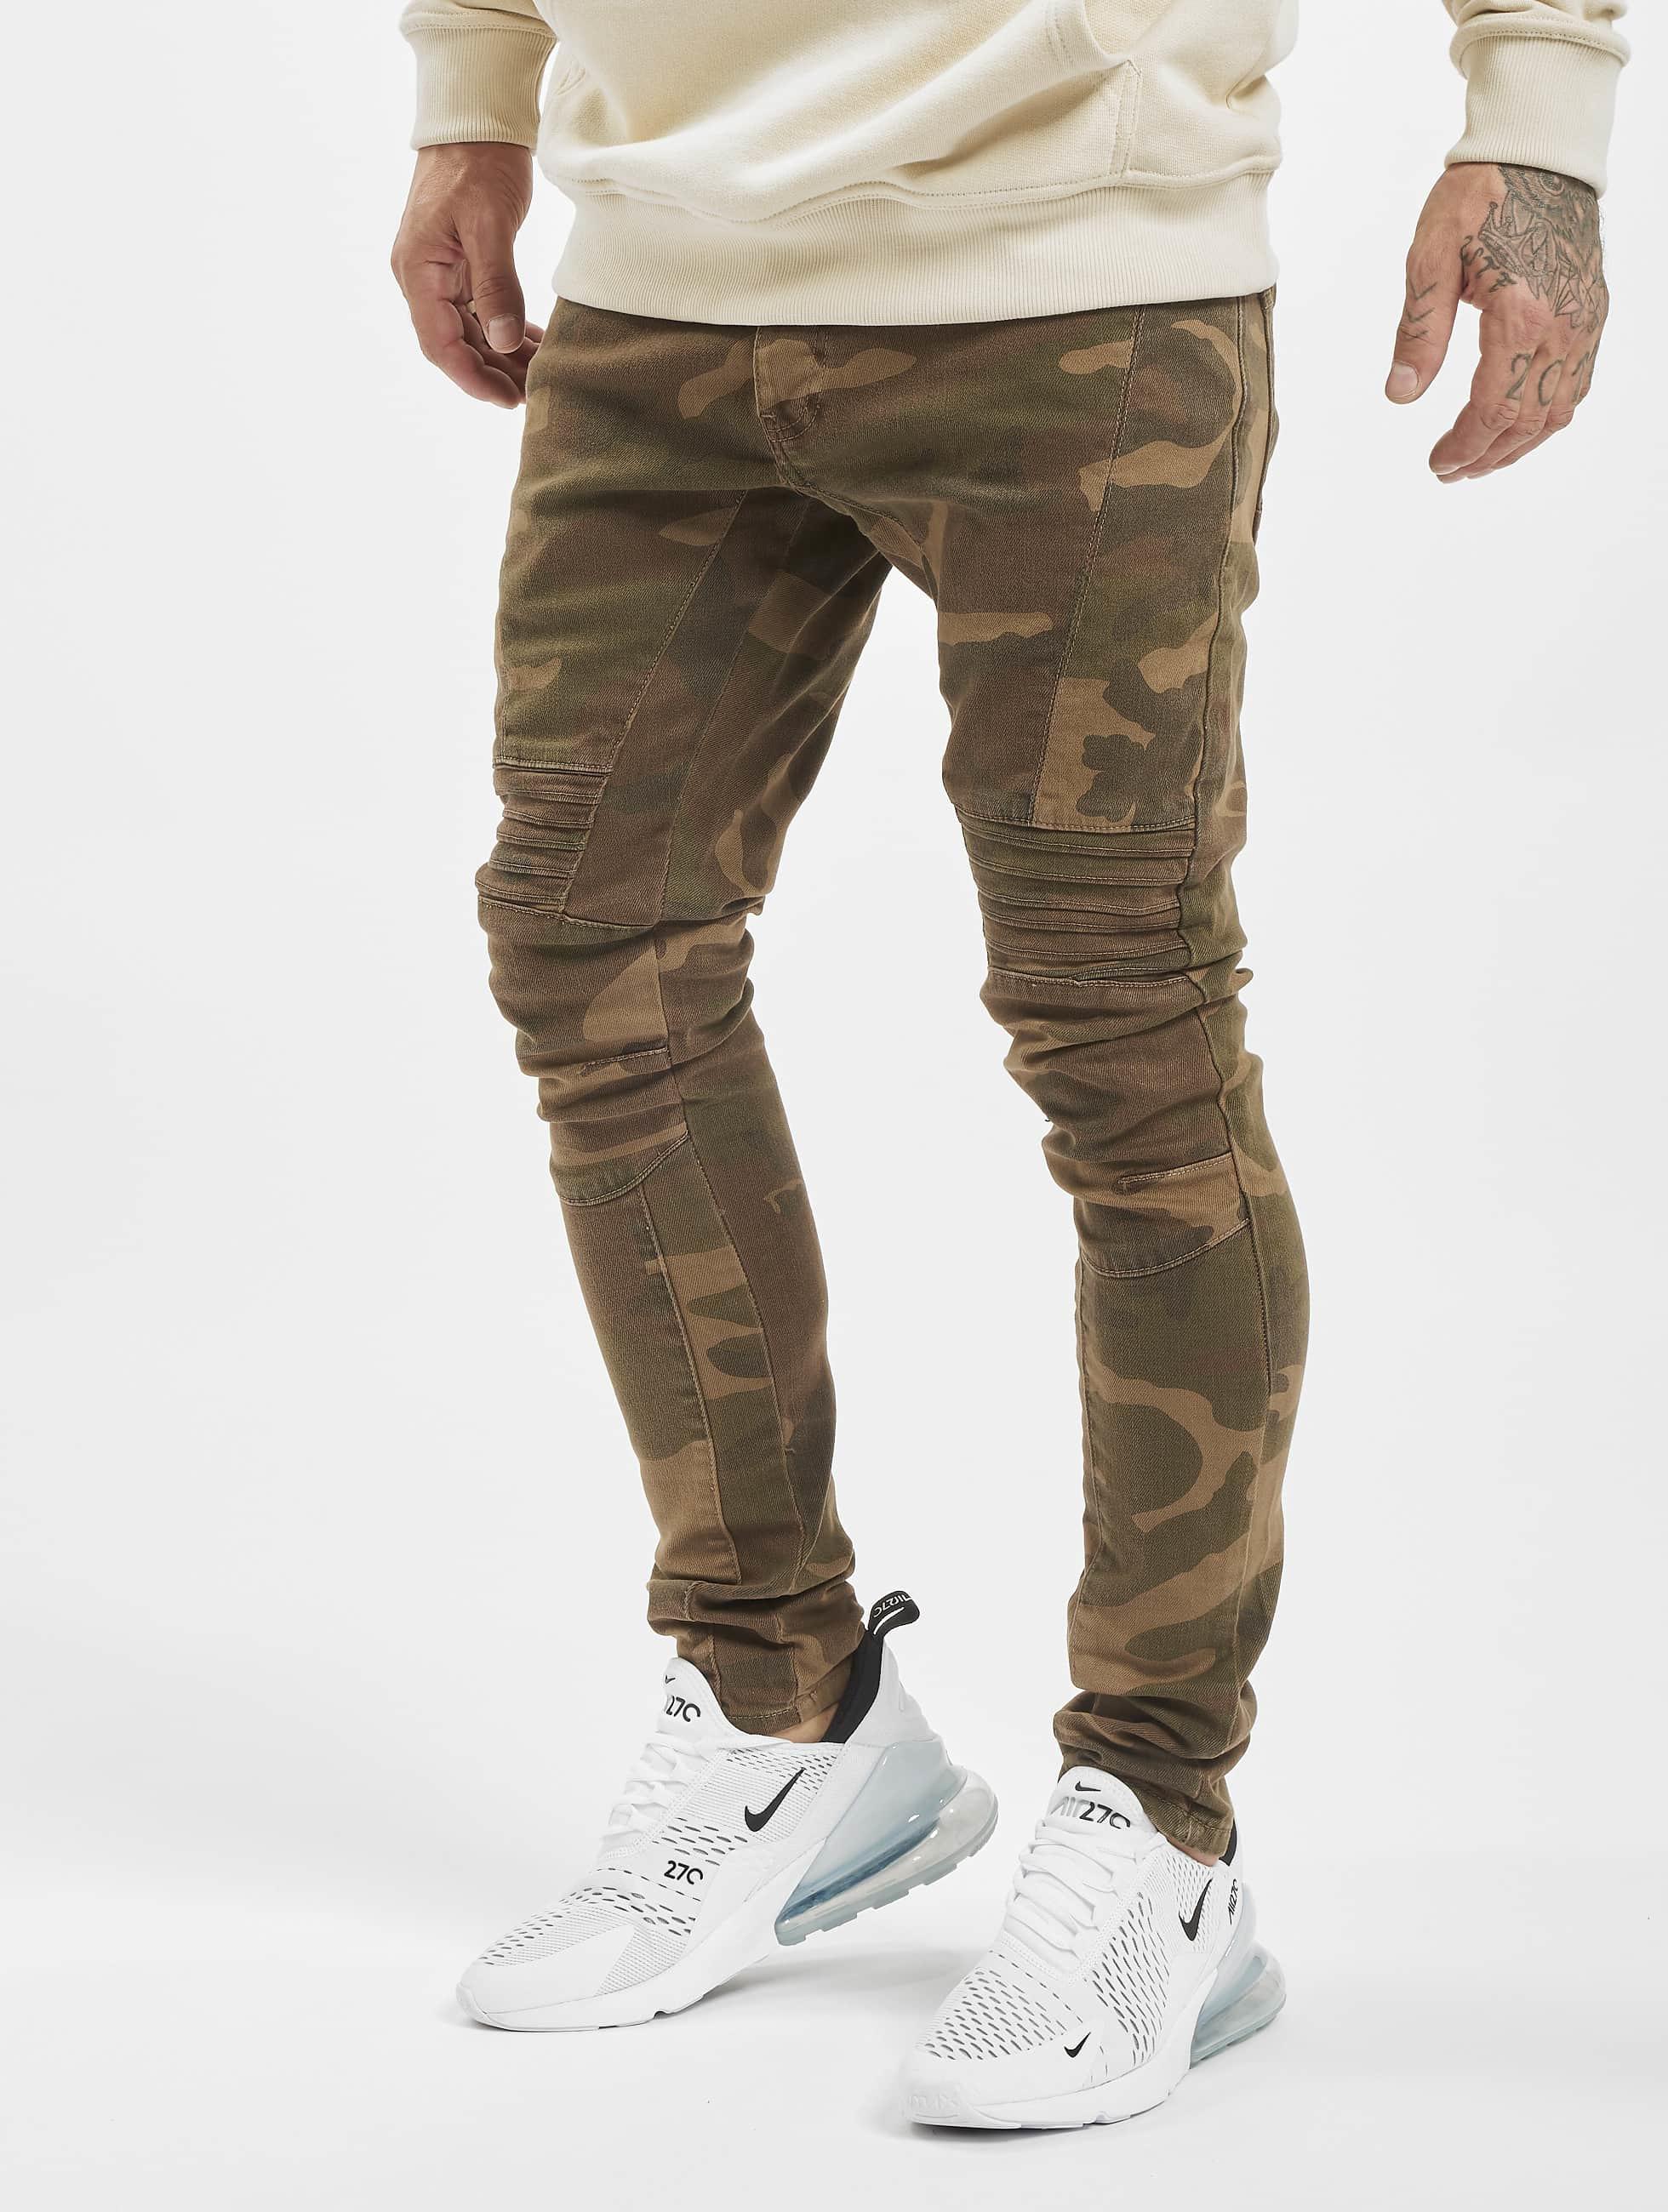 2Y Slim Fit Jeans Pakka camouflage